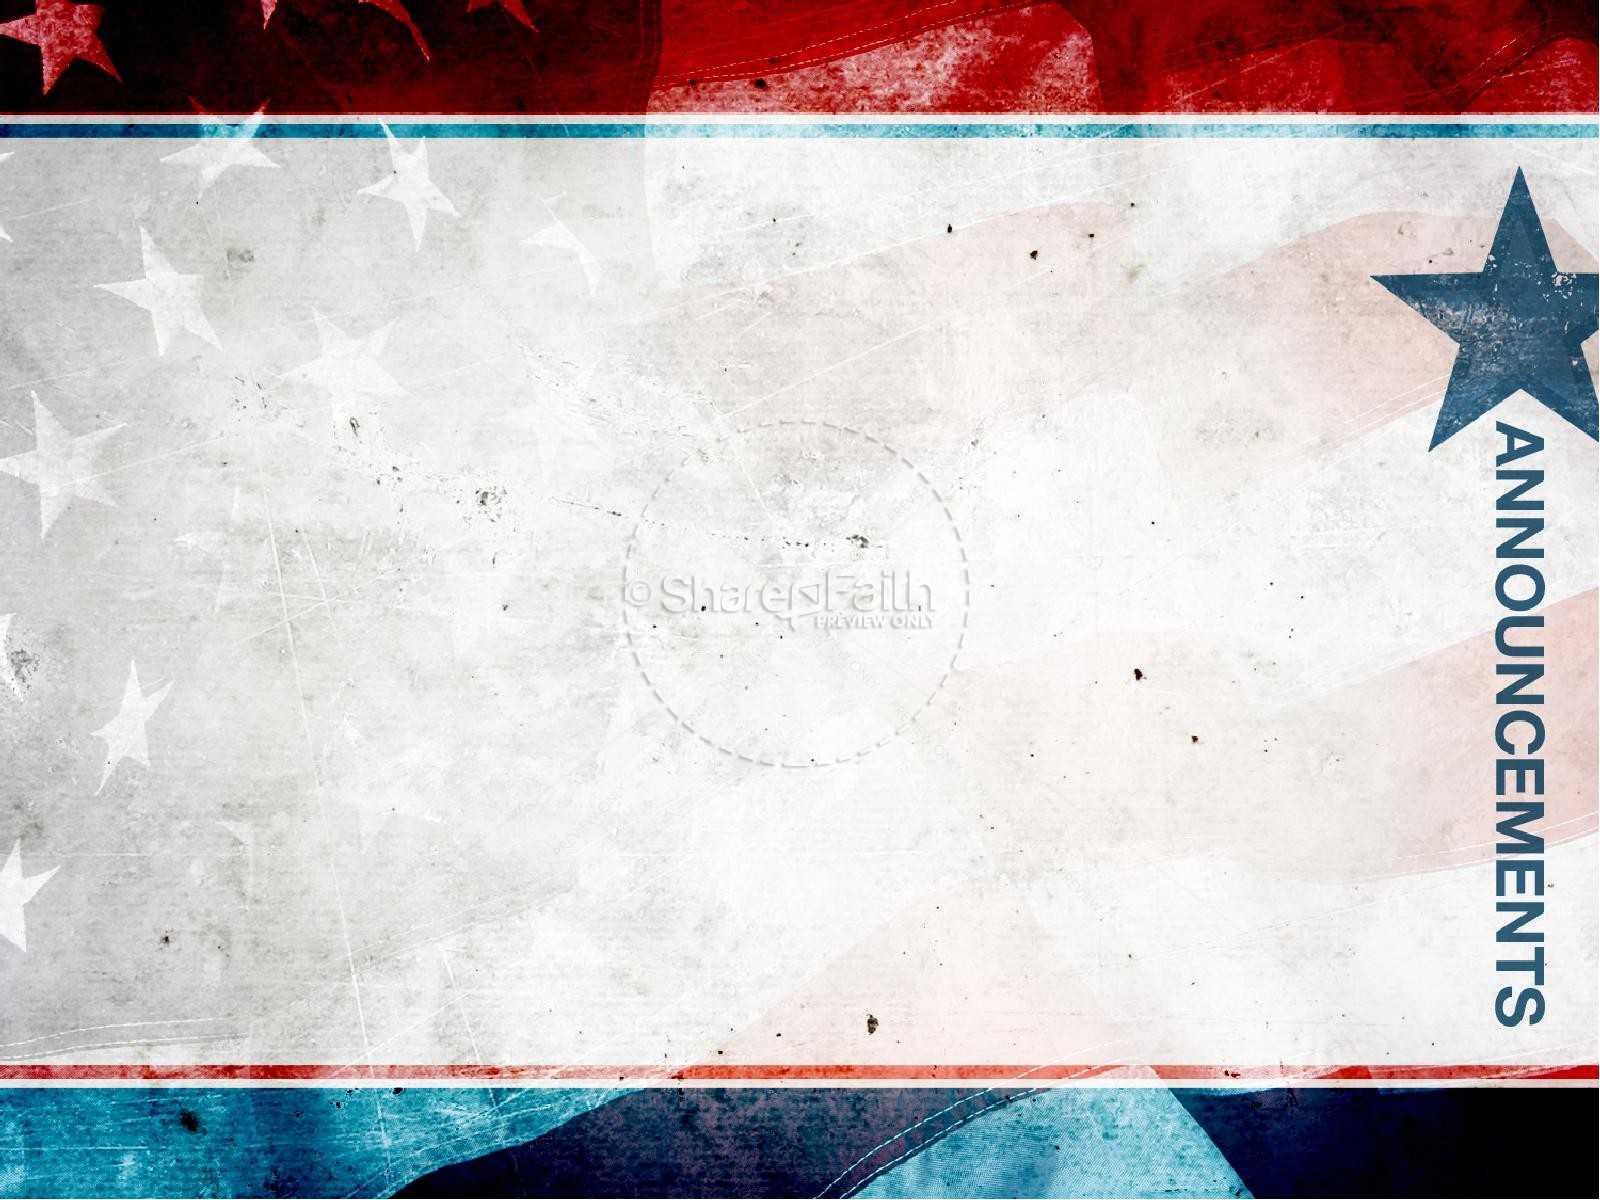 Patriotic Powerpoint Template - Atlantaauctionco For Patriotic Powerpoint Template